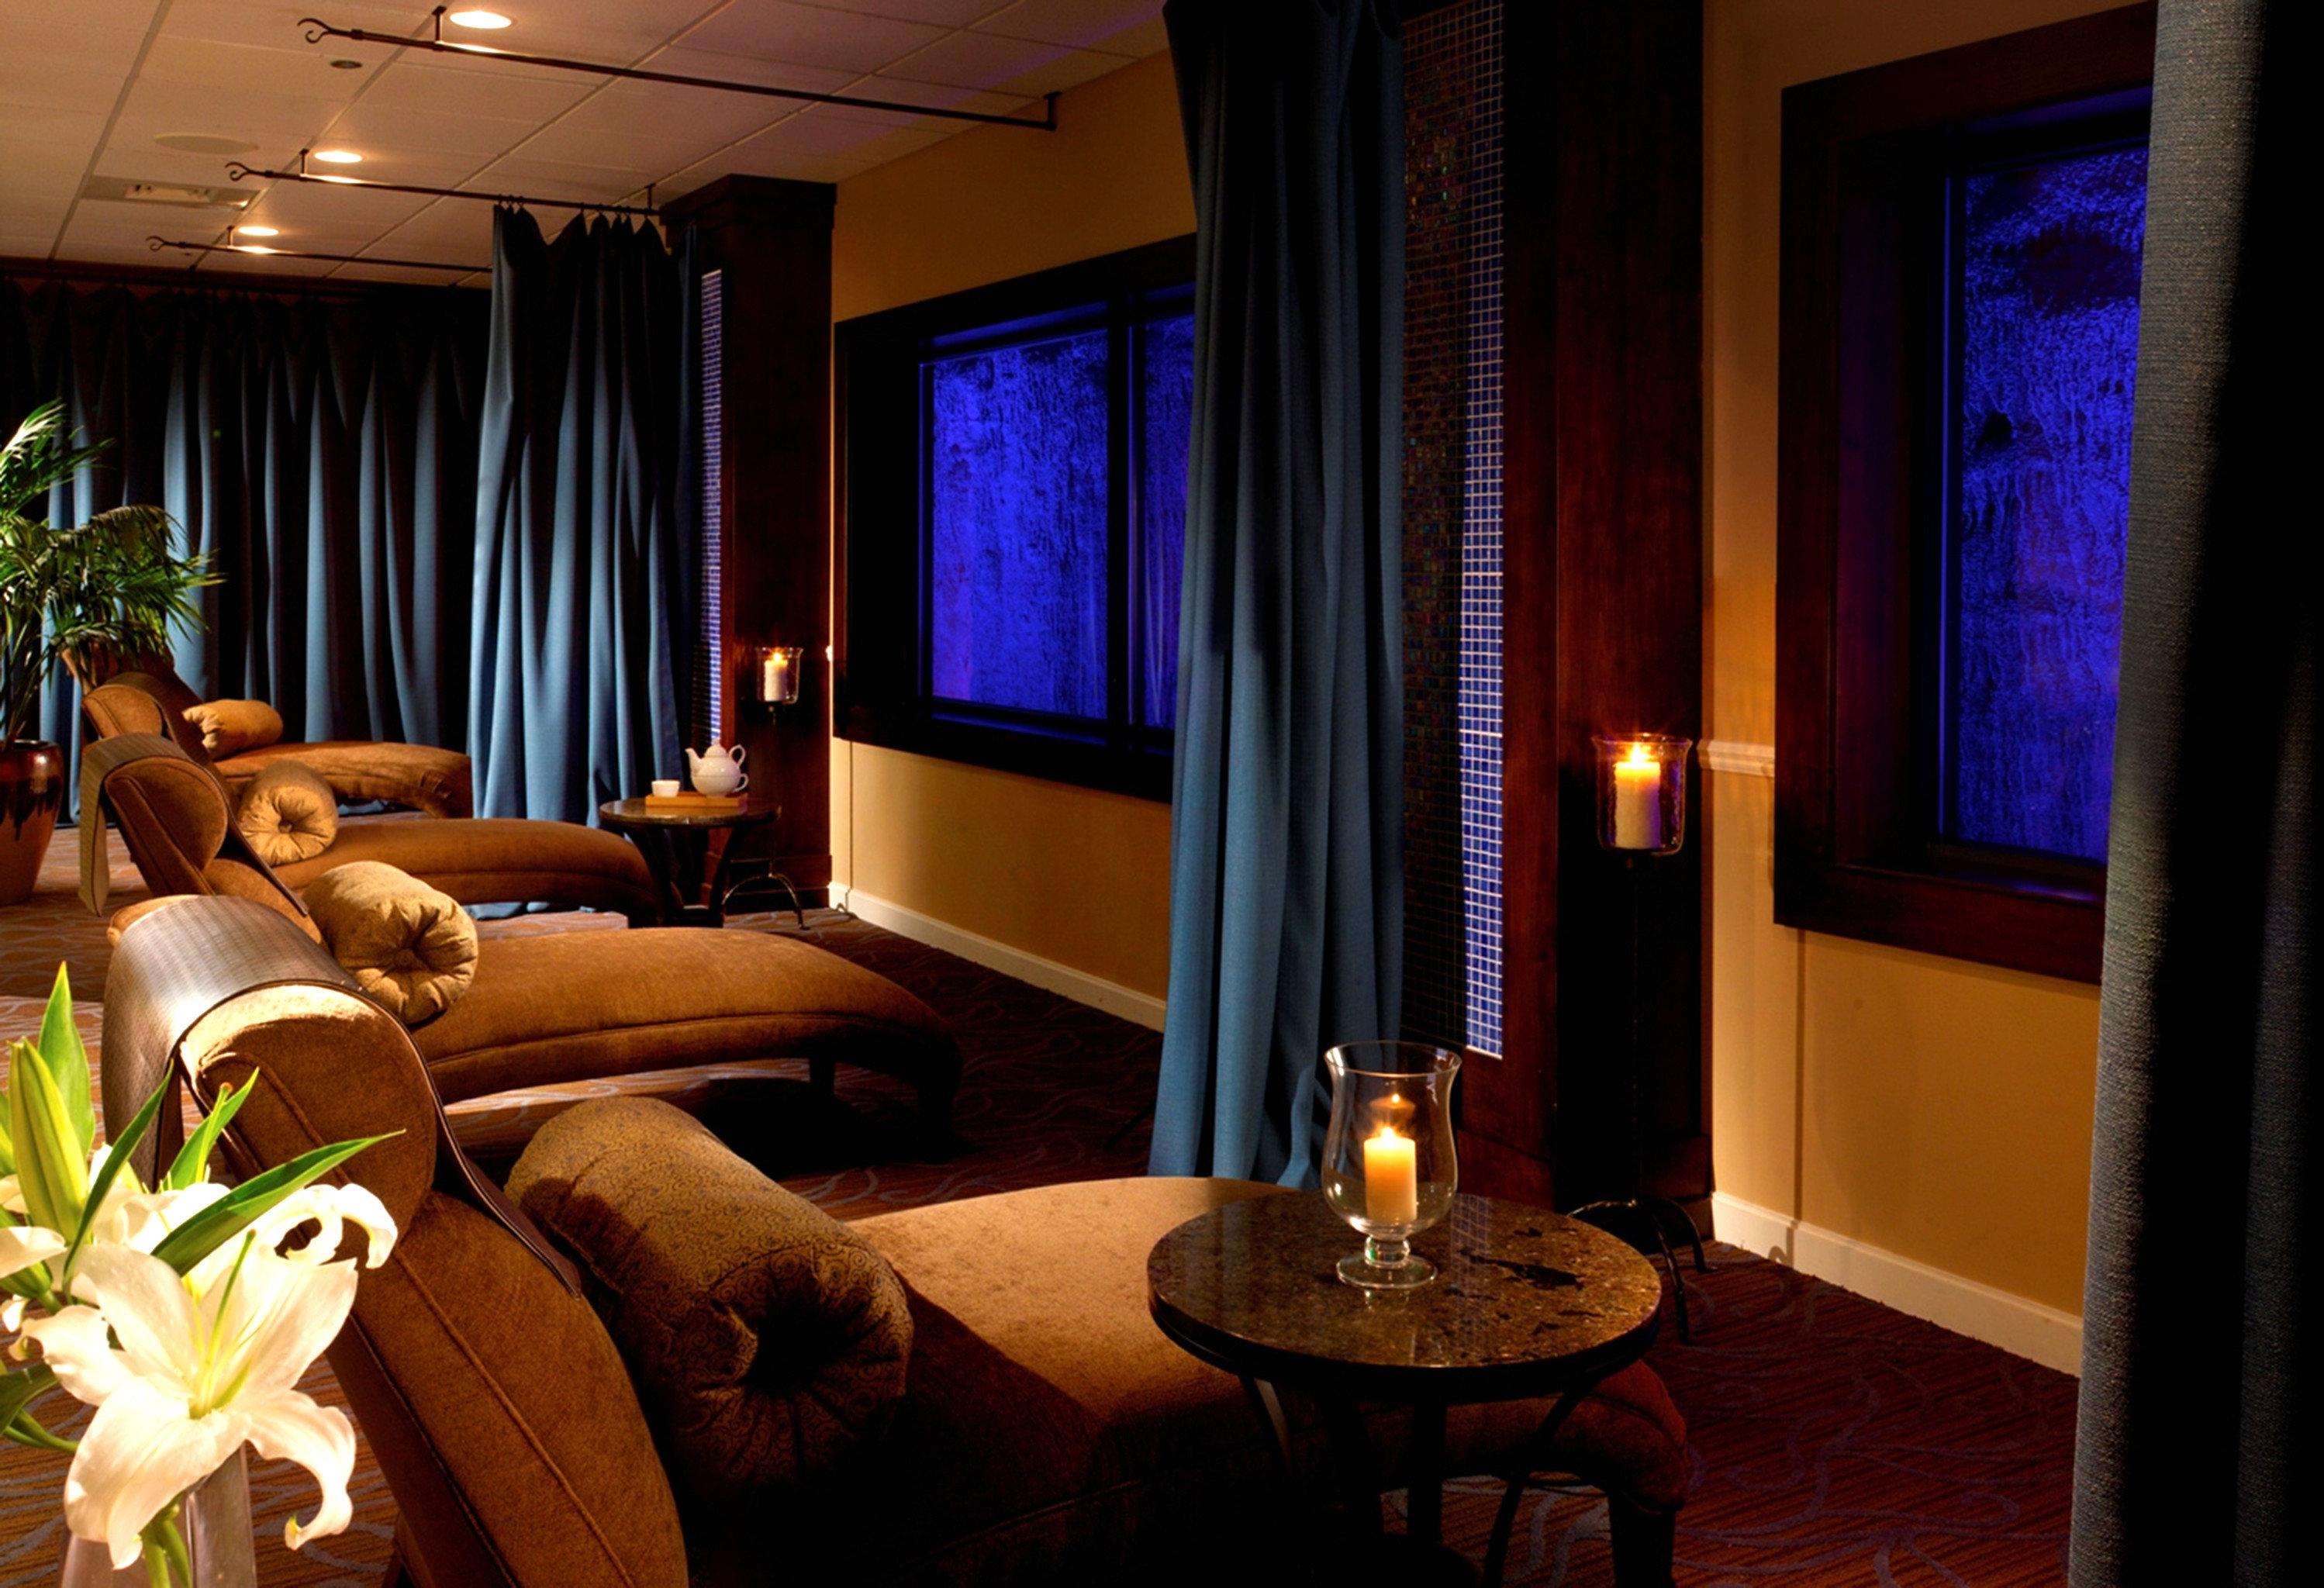 Lounge Luxury Modern Romantic curtain property Suite home living room lighting Lobby Resort